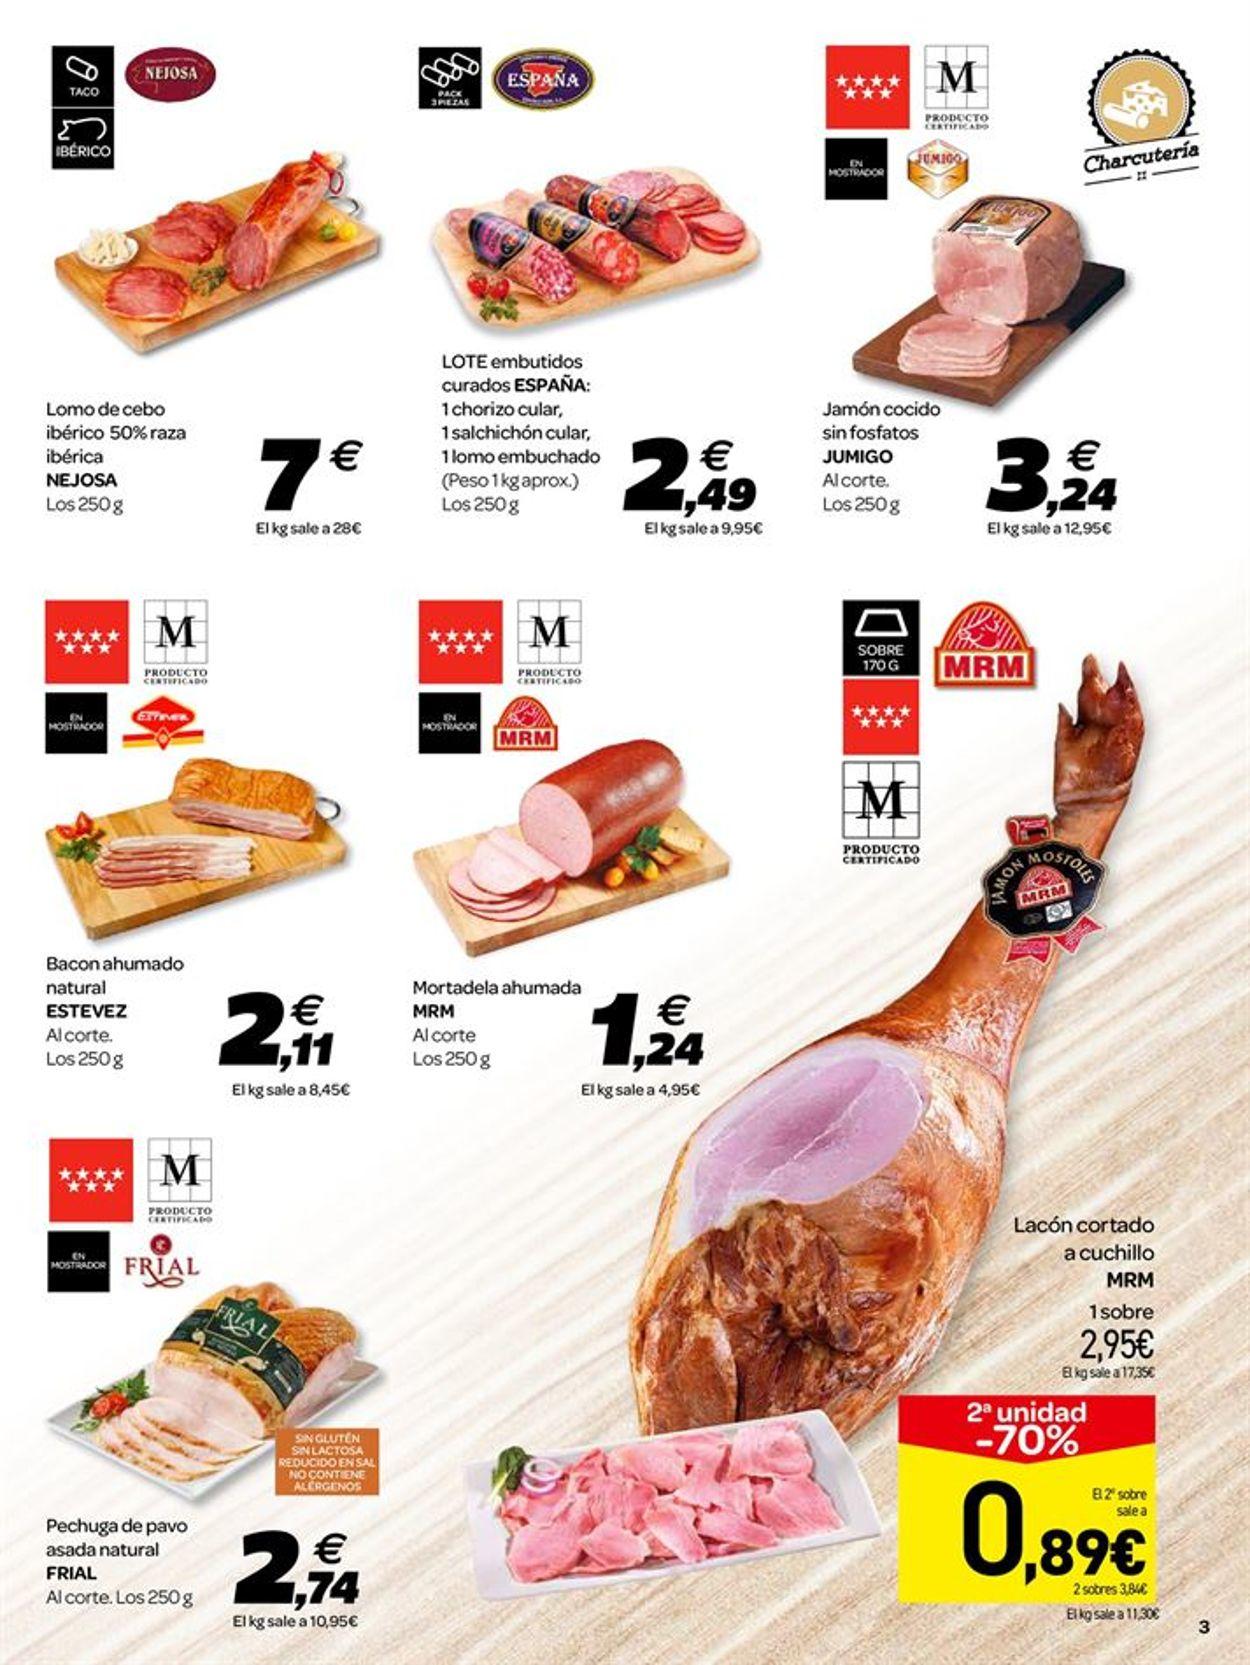 Carrefour Folleto - 10.07-24.07.2019 (Página 3)